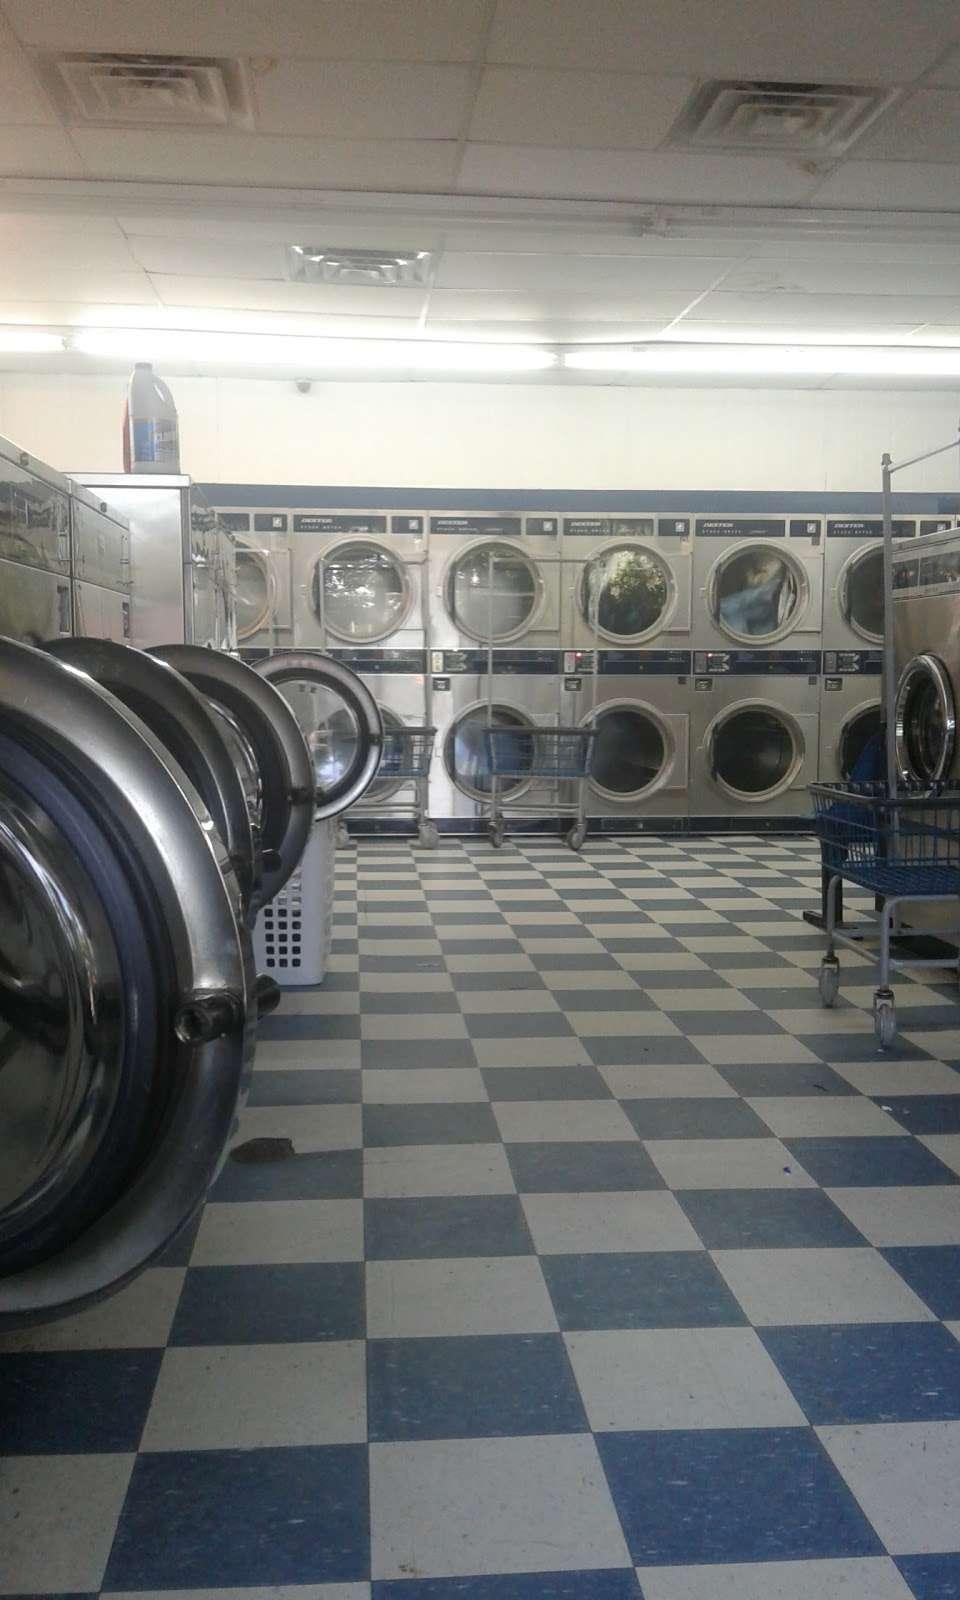 Huntersville Coin Laundry - laundry  | Photo 6 of 10 | Address: 14339 Hunters Rd, Huntersville, NC 28078, USA | Phone: (704) 875-0965